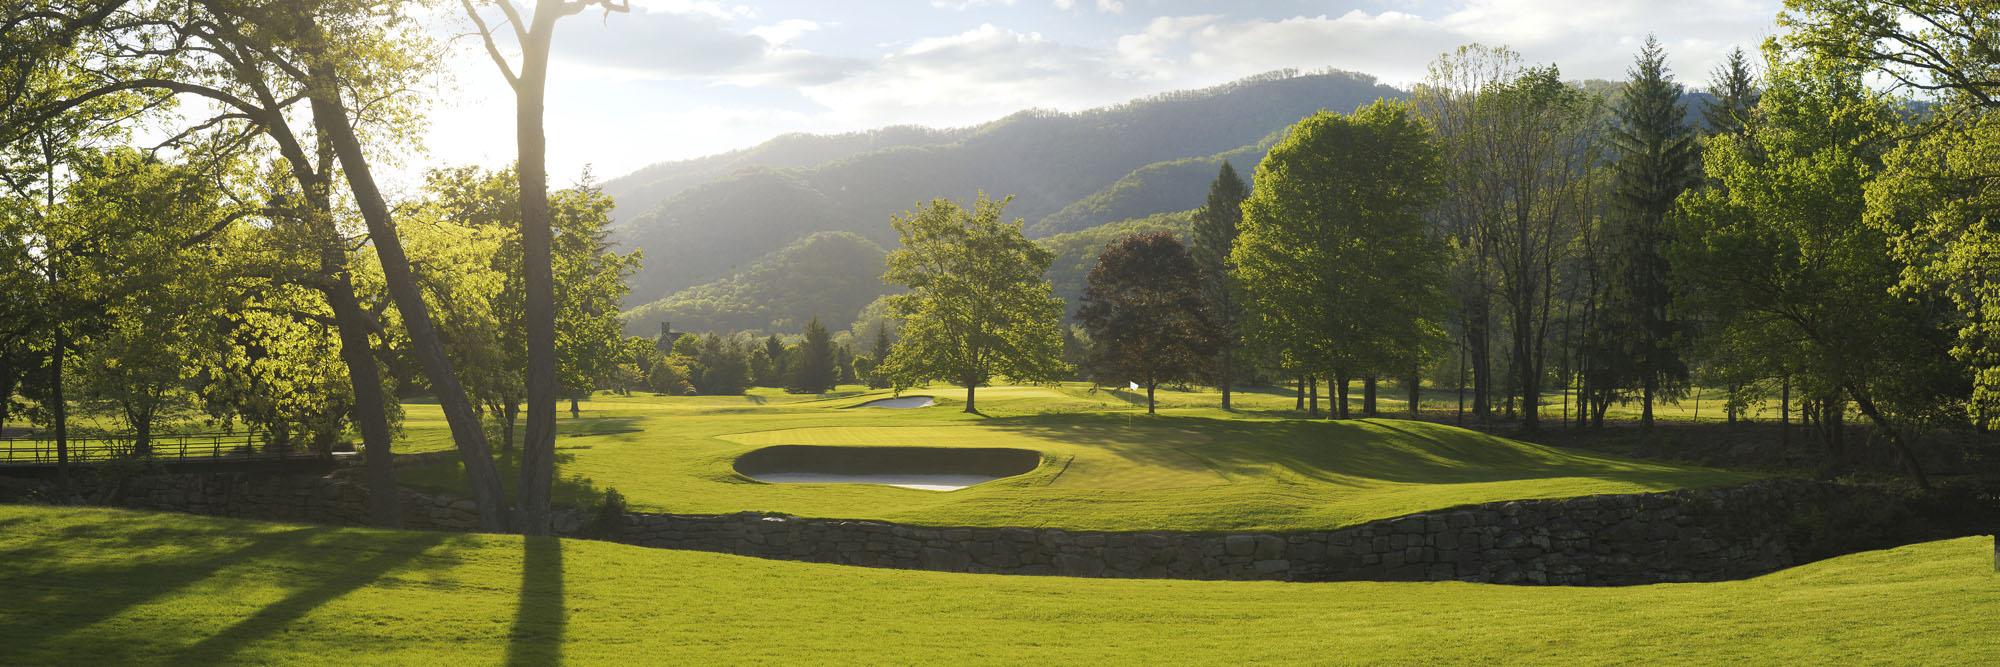 Golf Course Image - The Greenbrier Meadows Course No. 11